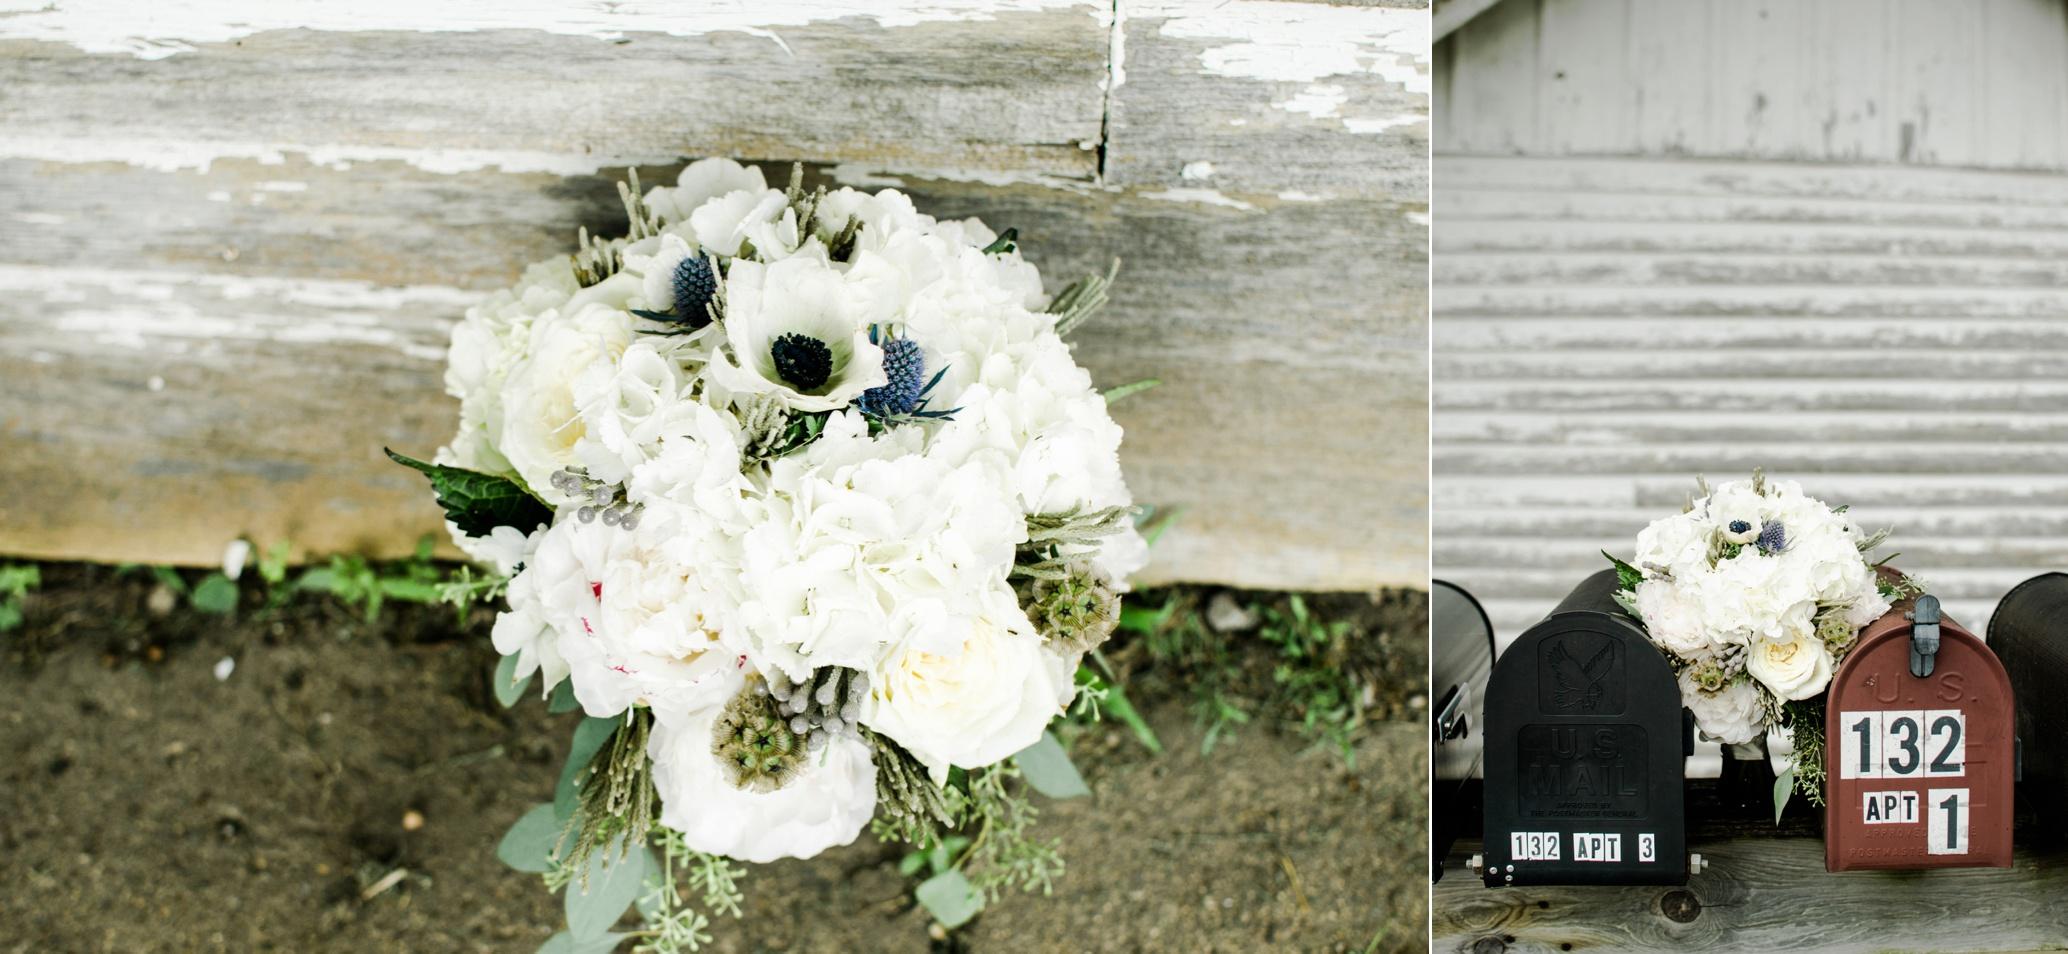 Palmer House and Stable Solon, IA | Ali Leigh Photo Minneapolis Wedding Photographer_0260.jpg